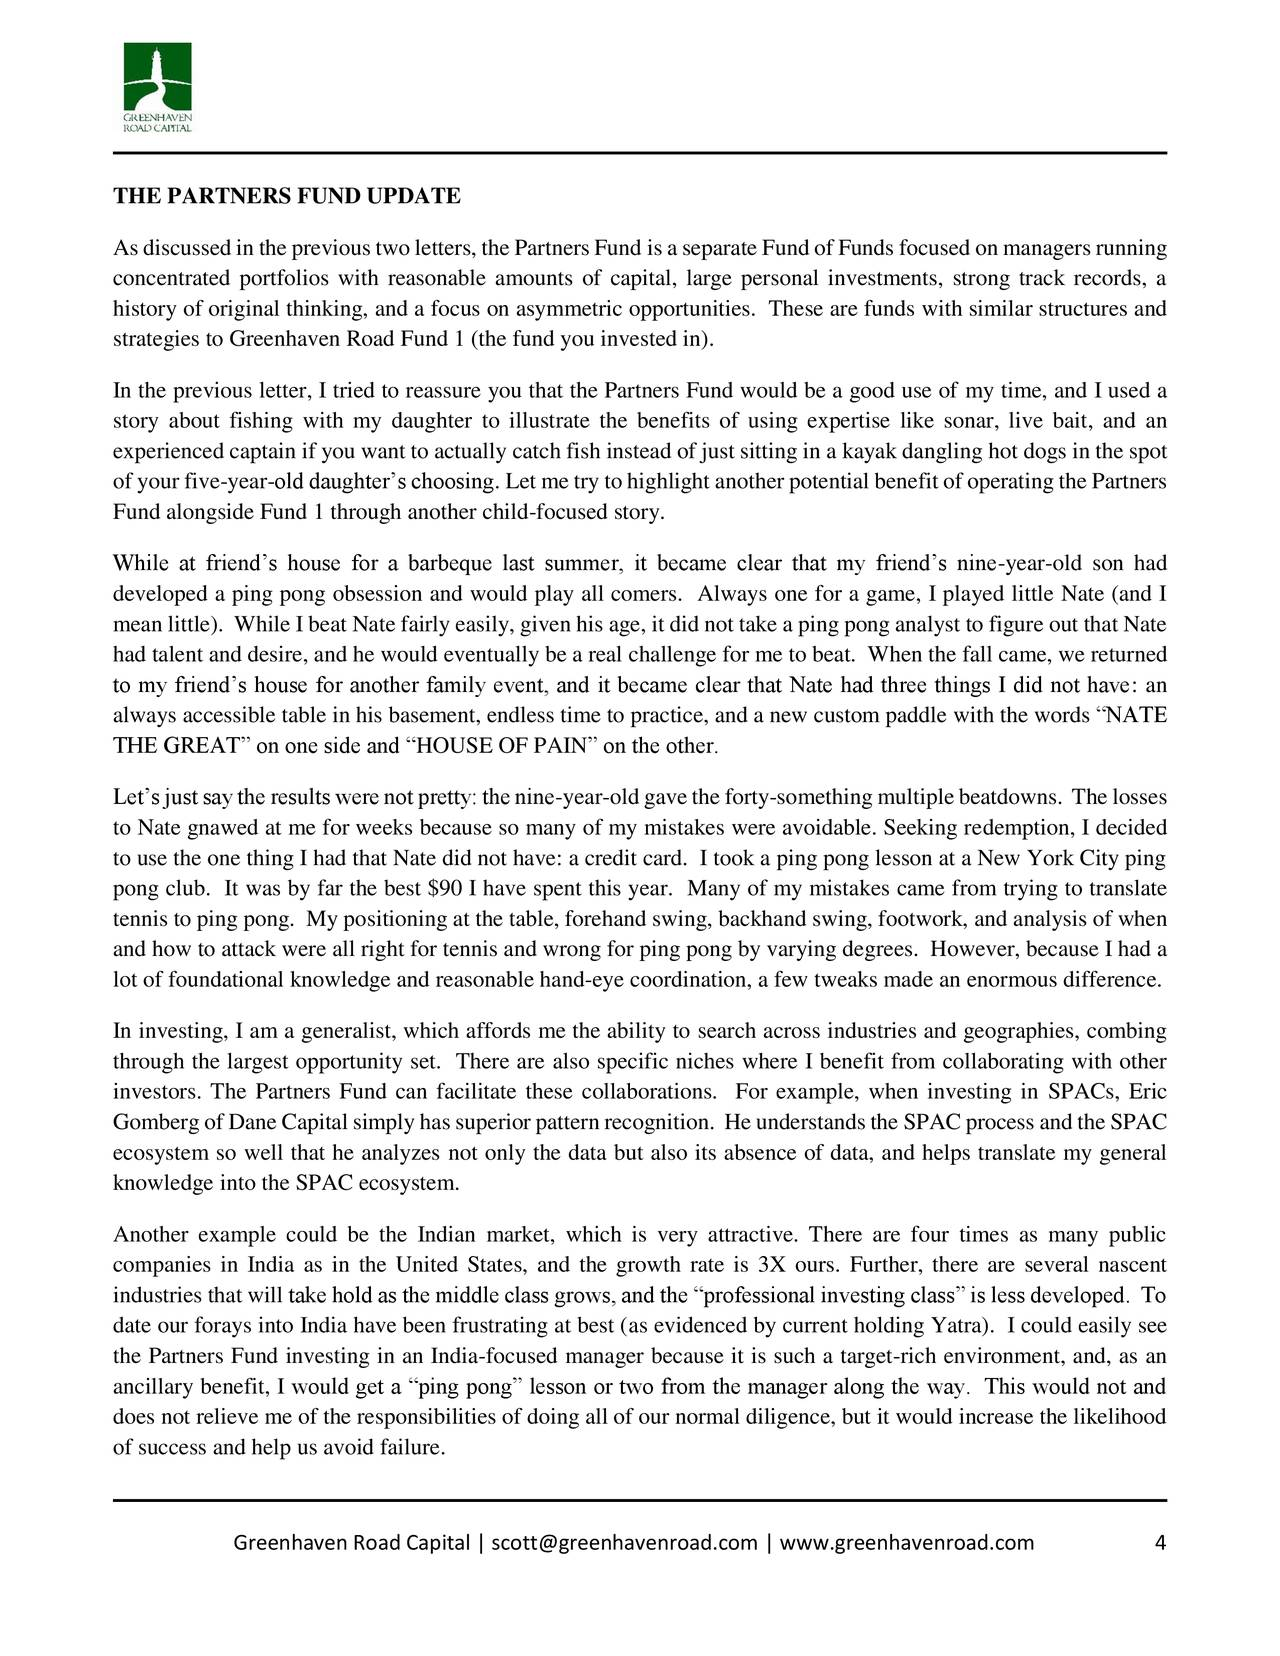 Greenhaven Road Capital Q4 2017 Investor Letter Fiat